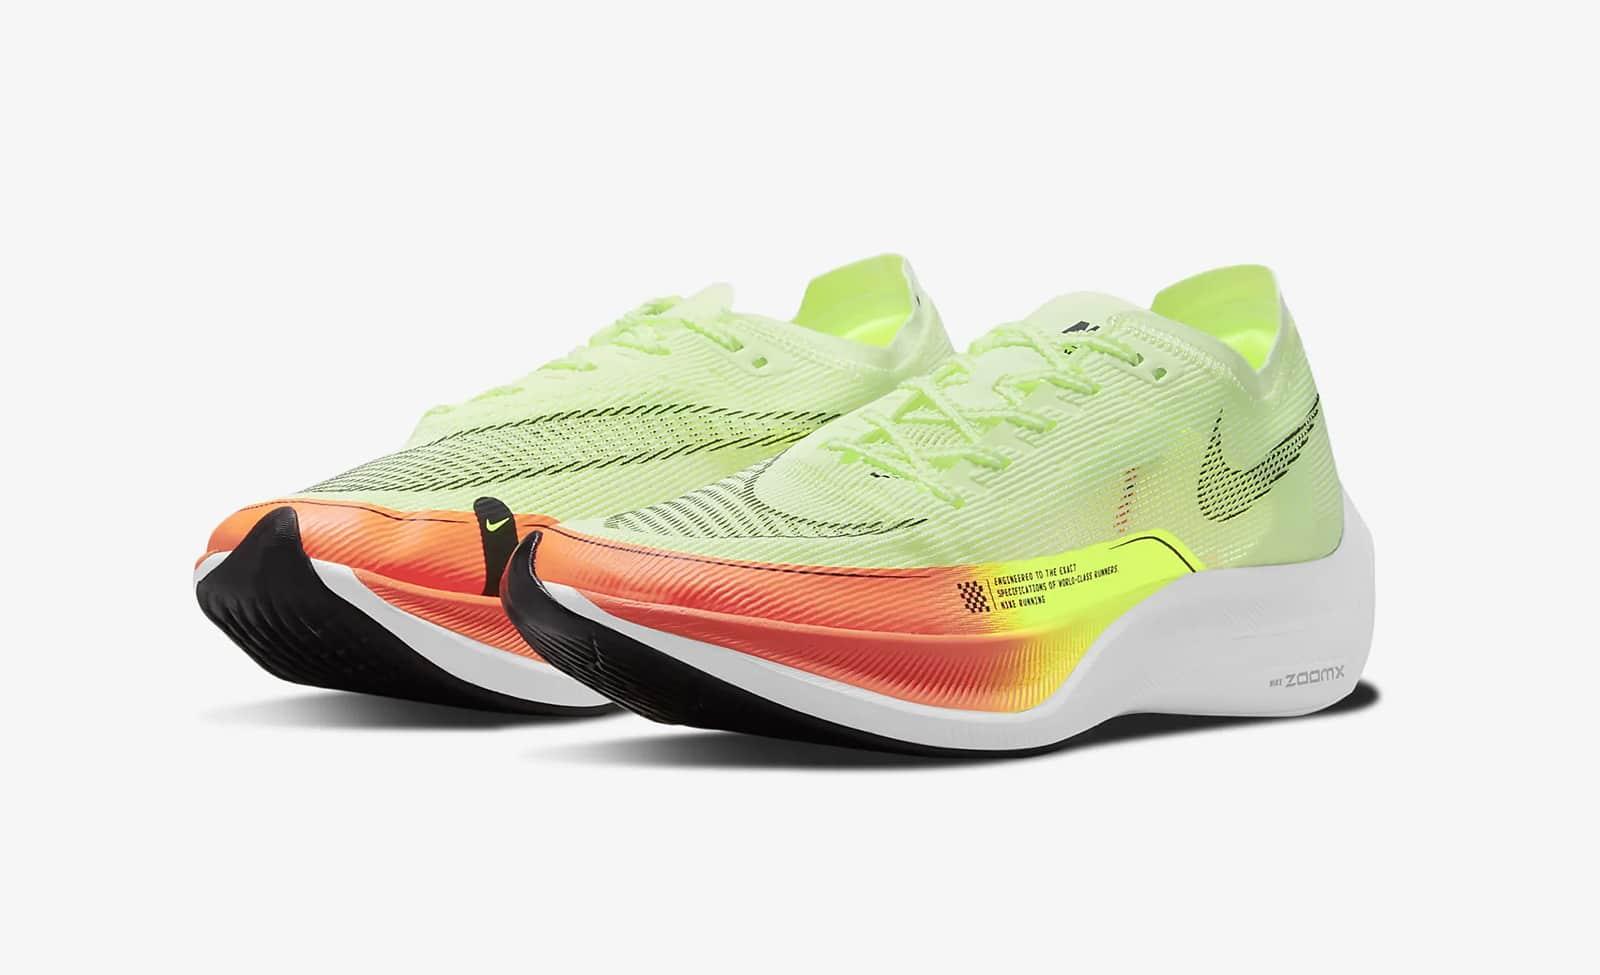 Nike Air Zoom Vaporfly NEXT% 2